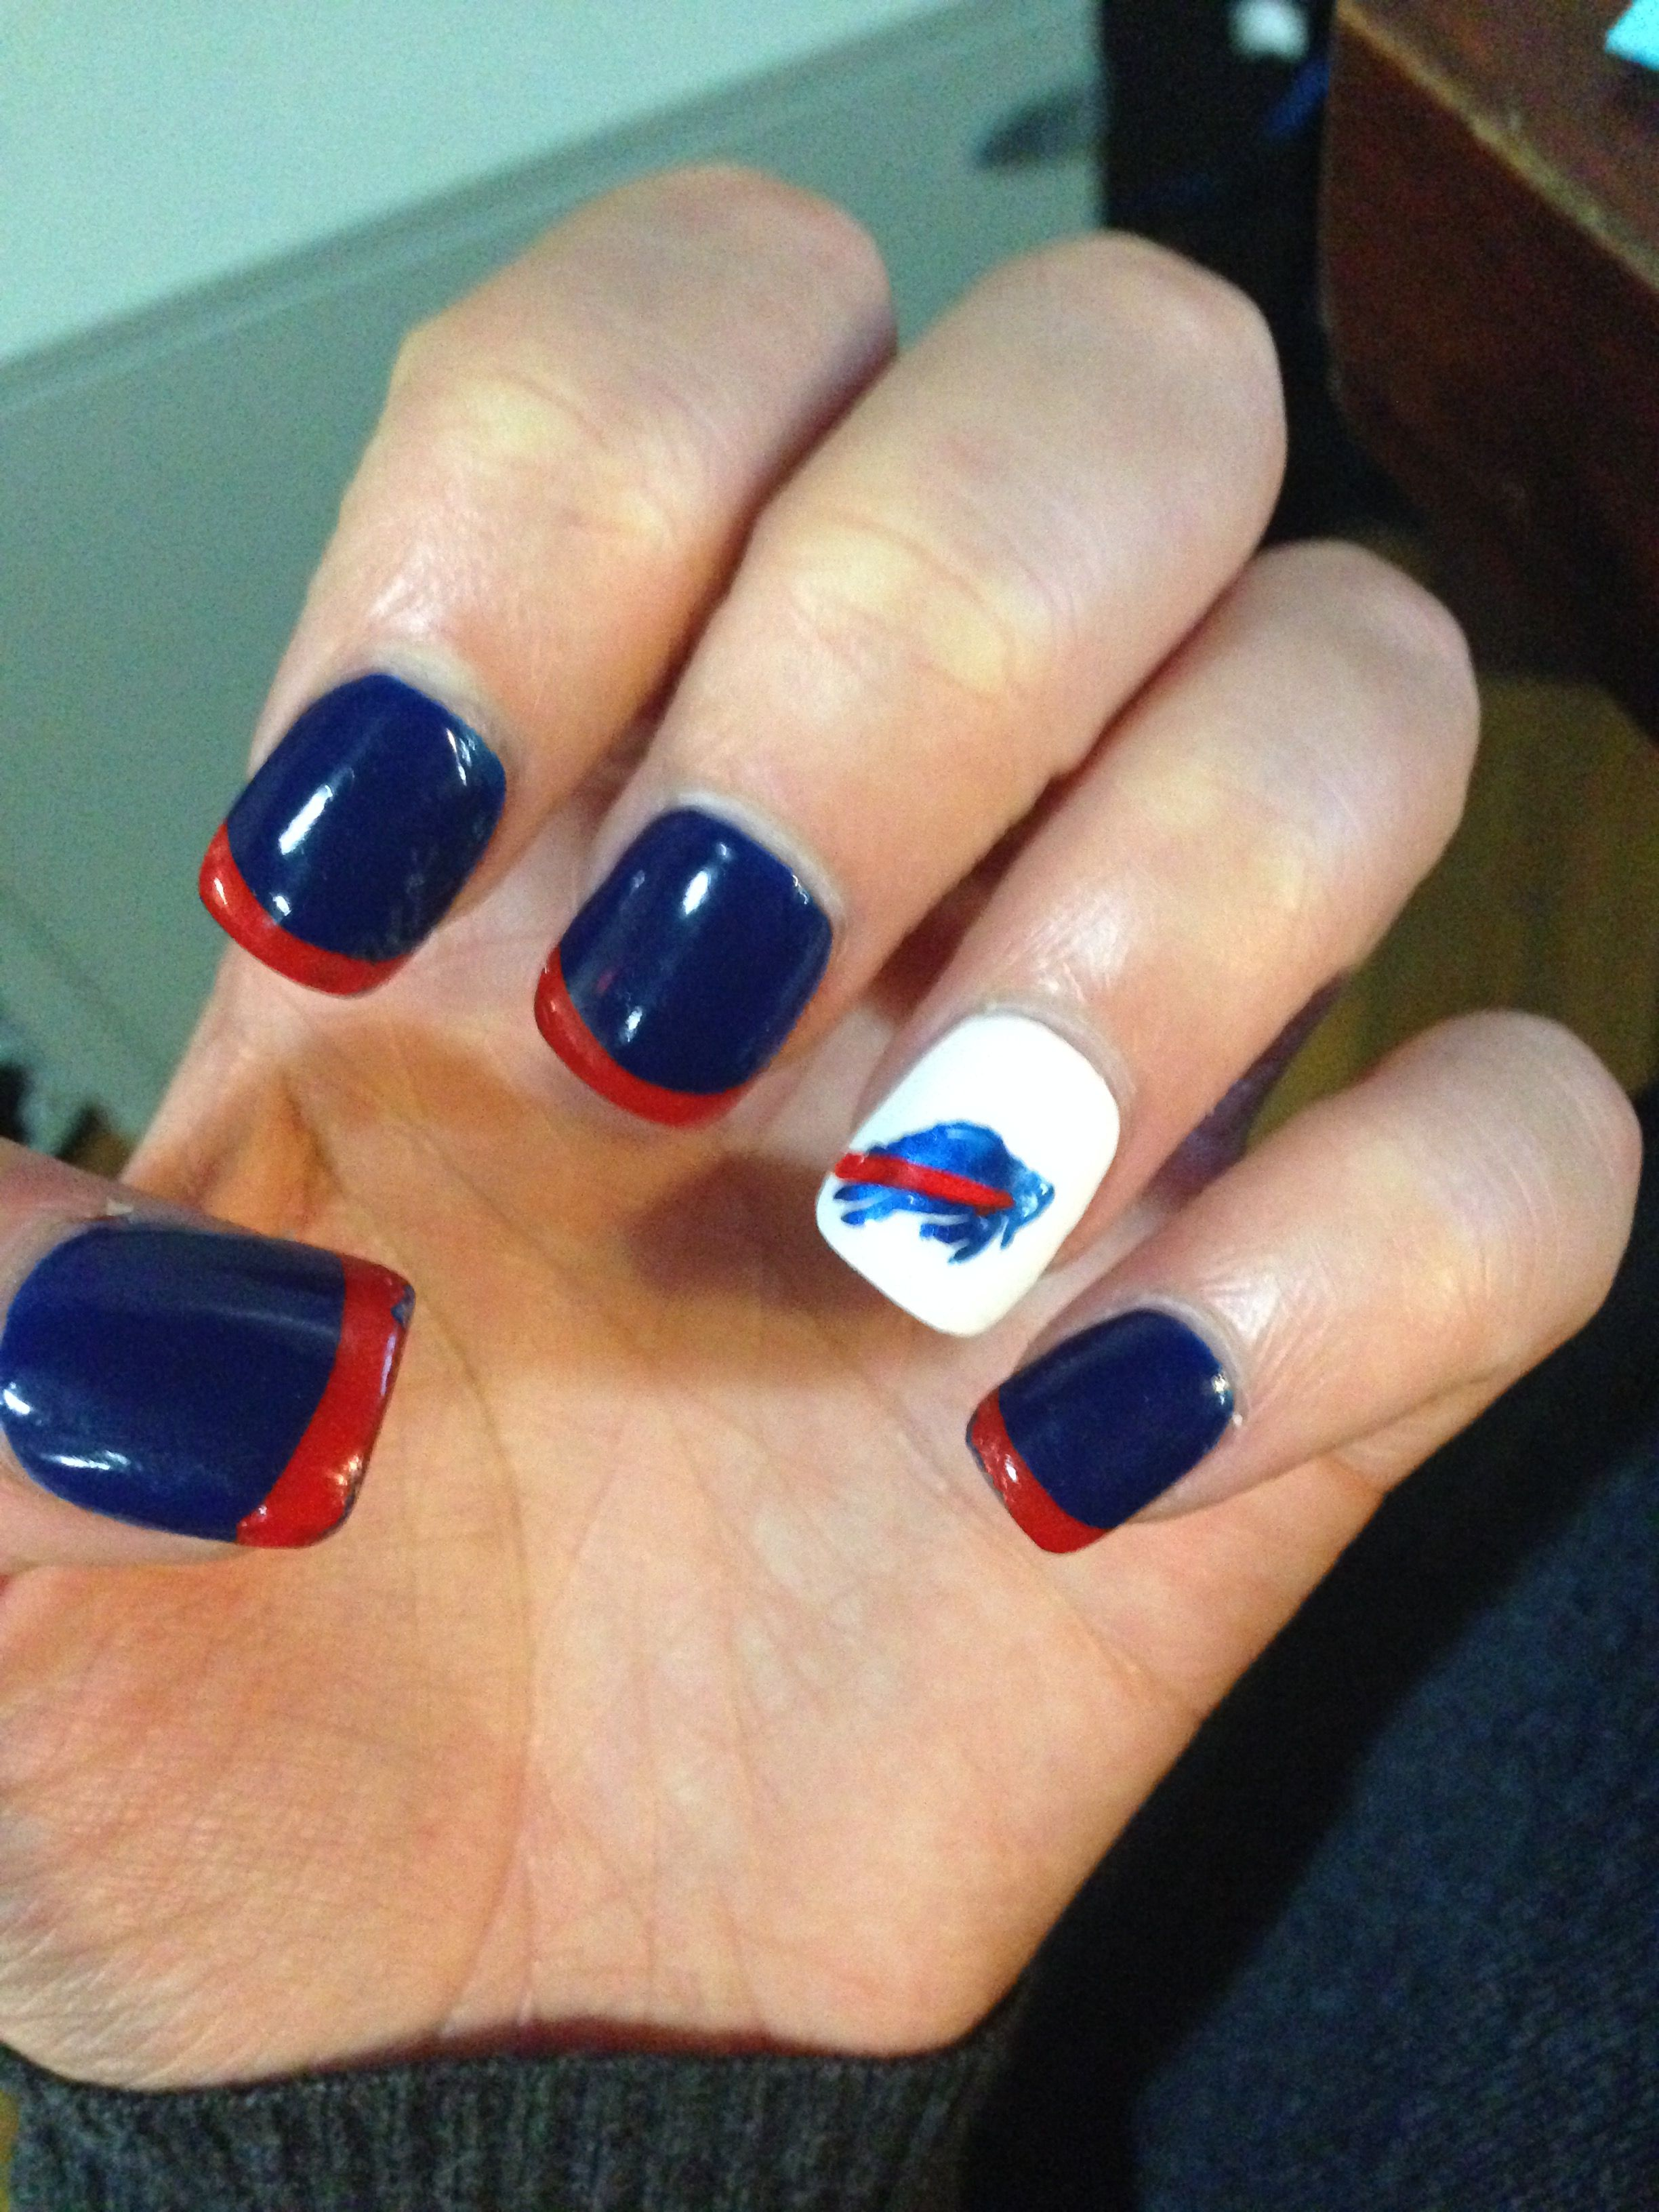 Buffalo bills nails | hehe | Pinterest